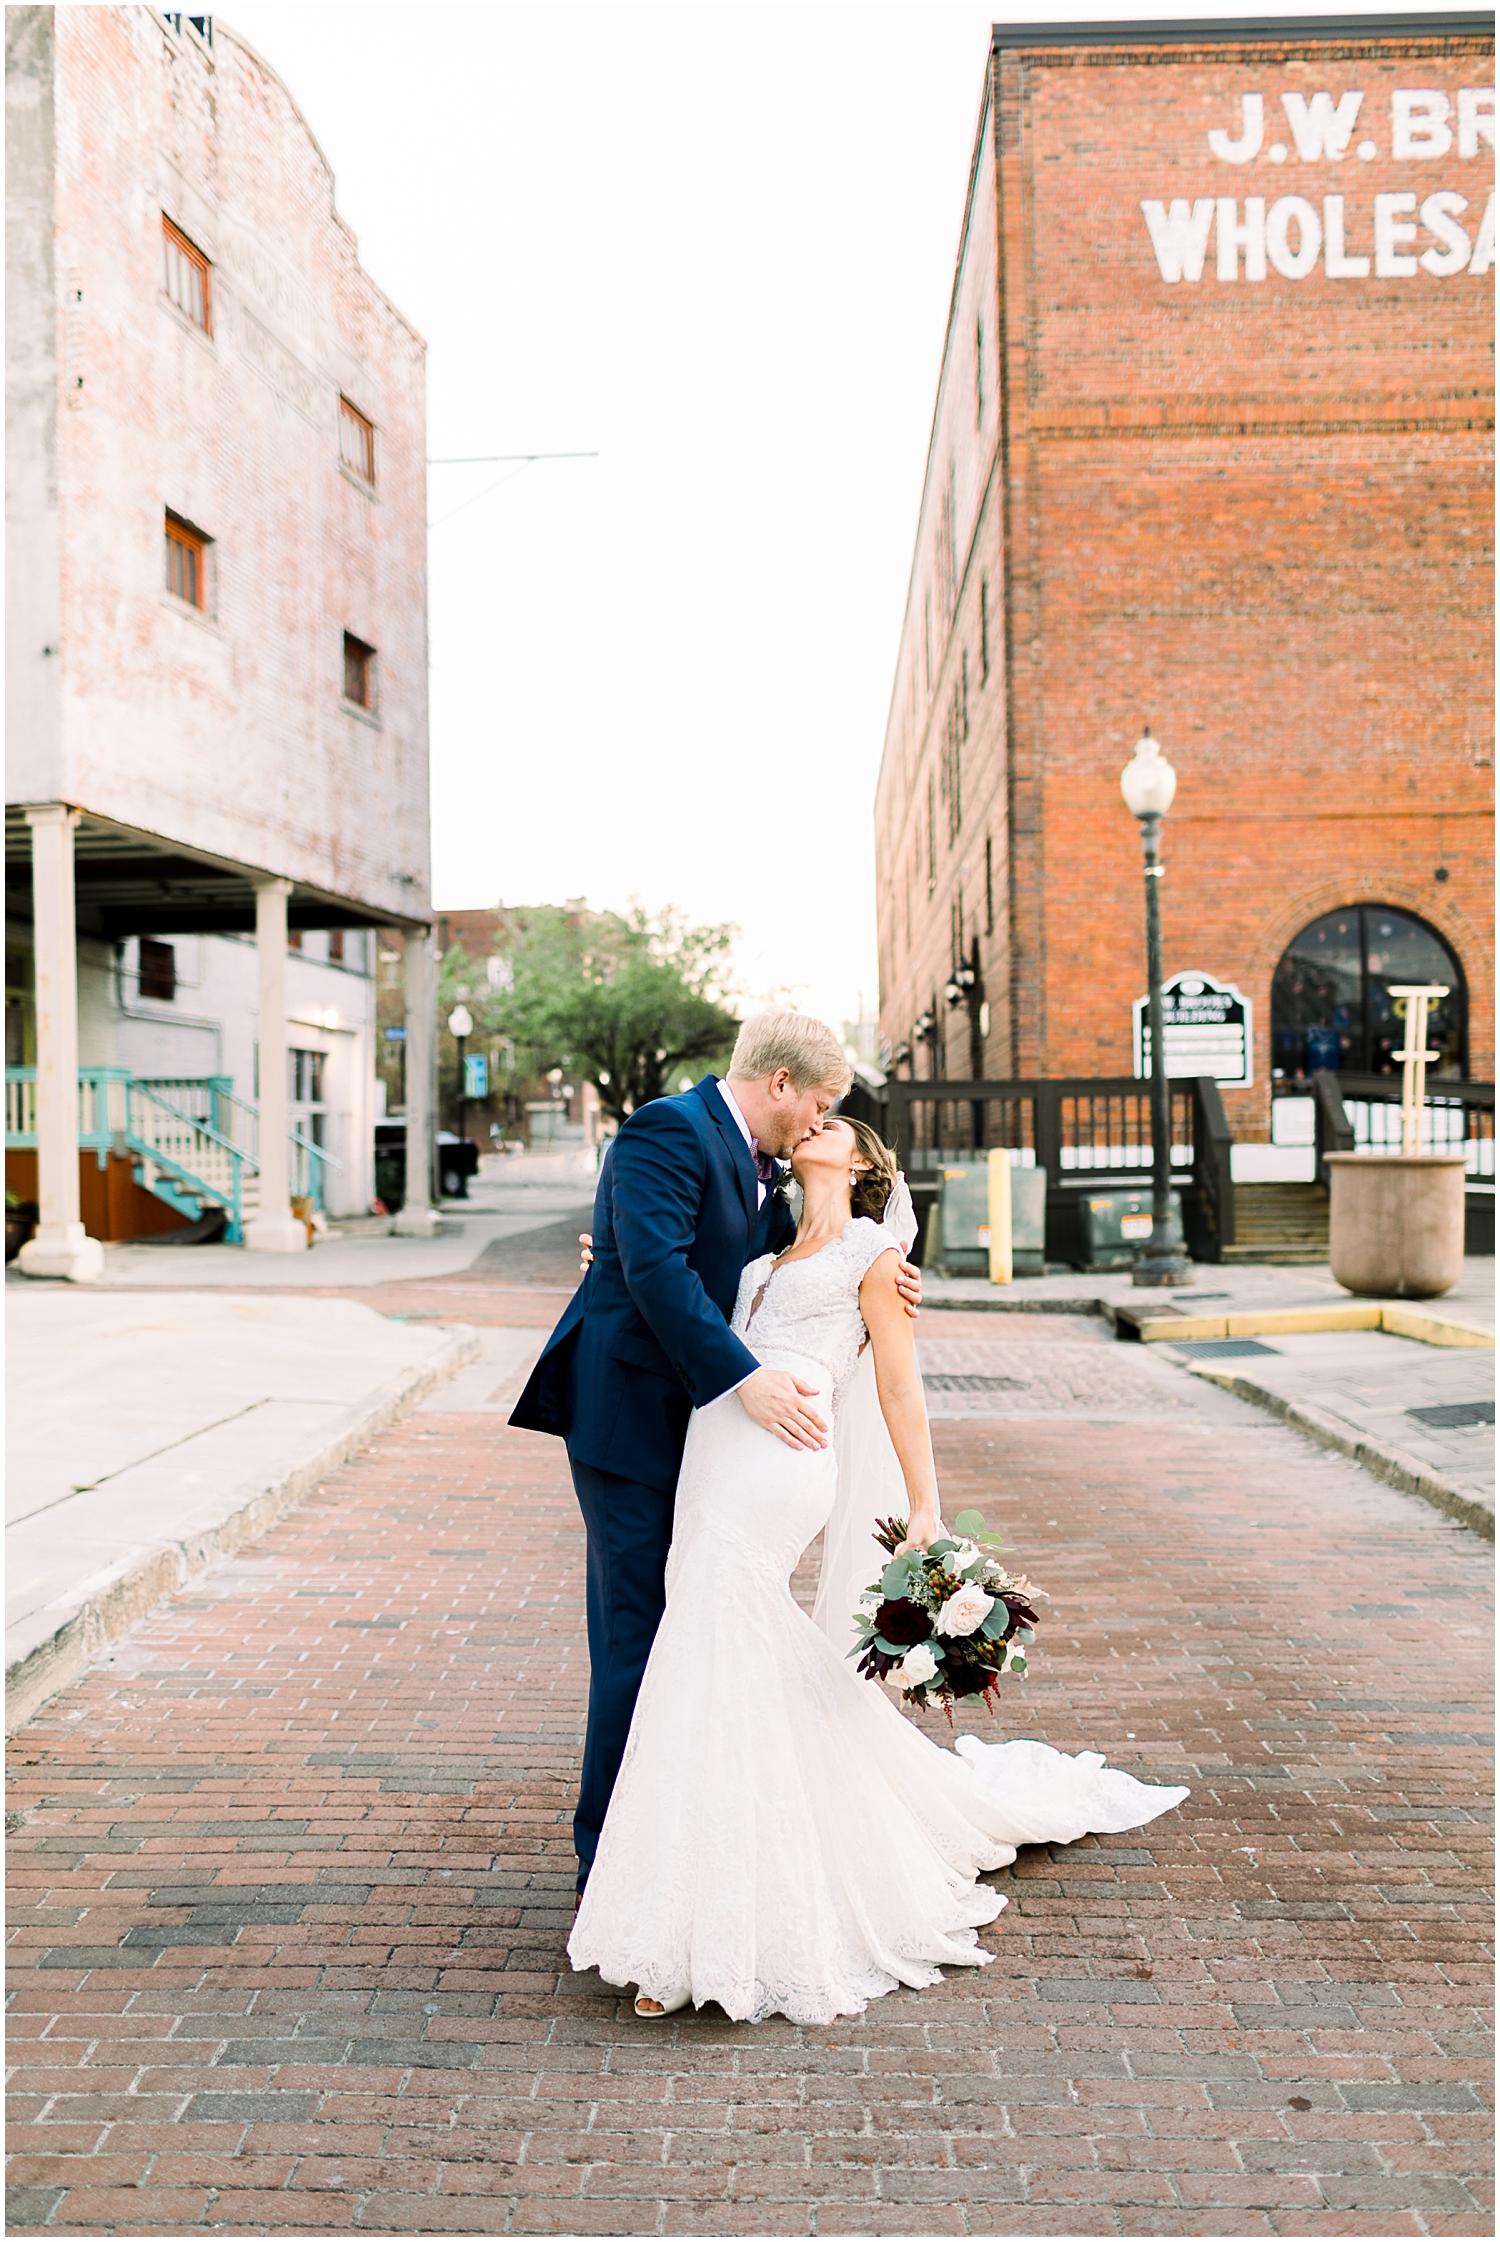 128 South Wedding venue, Downtown Wilmington NC Wedding_Erin L. Taylor Photography_0037.jpg